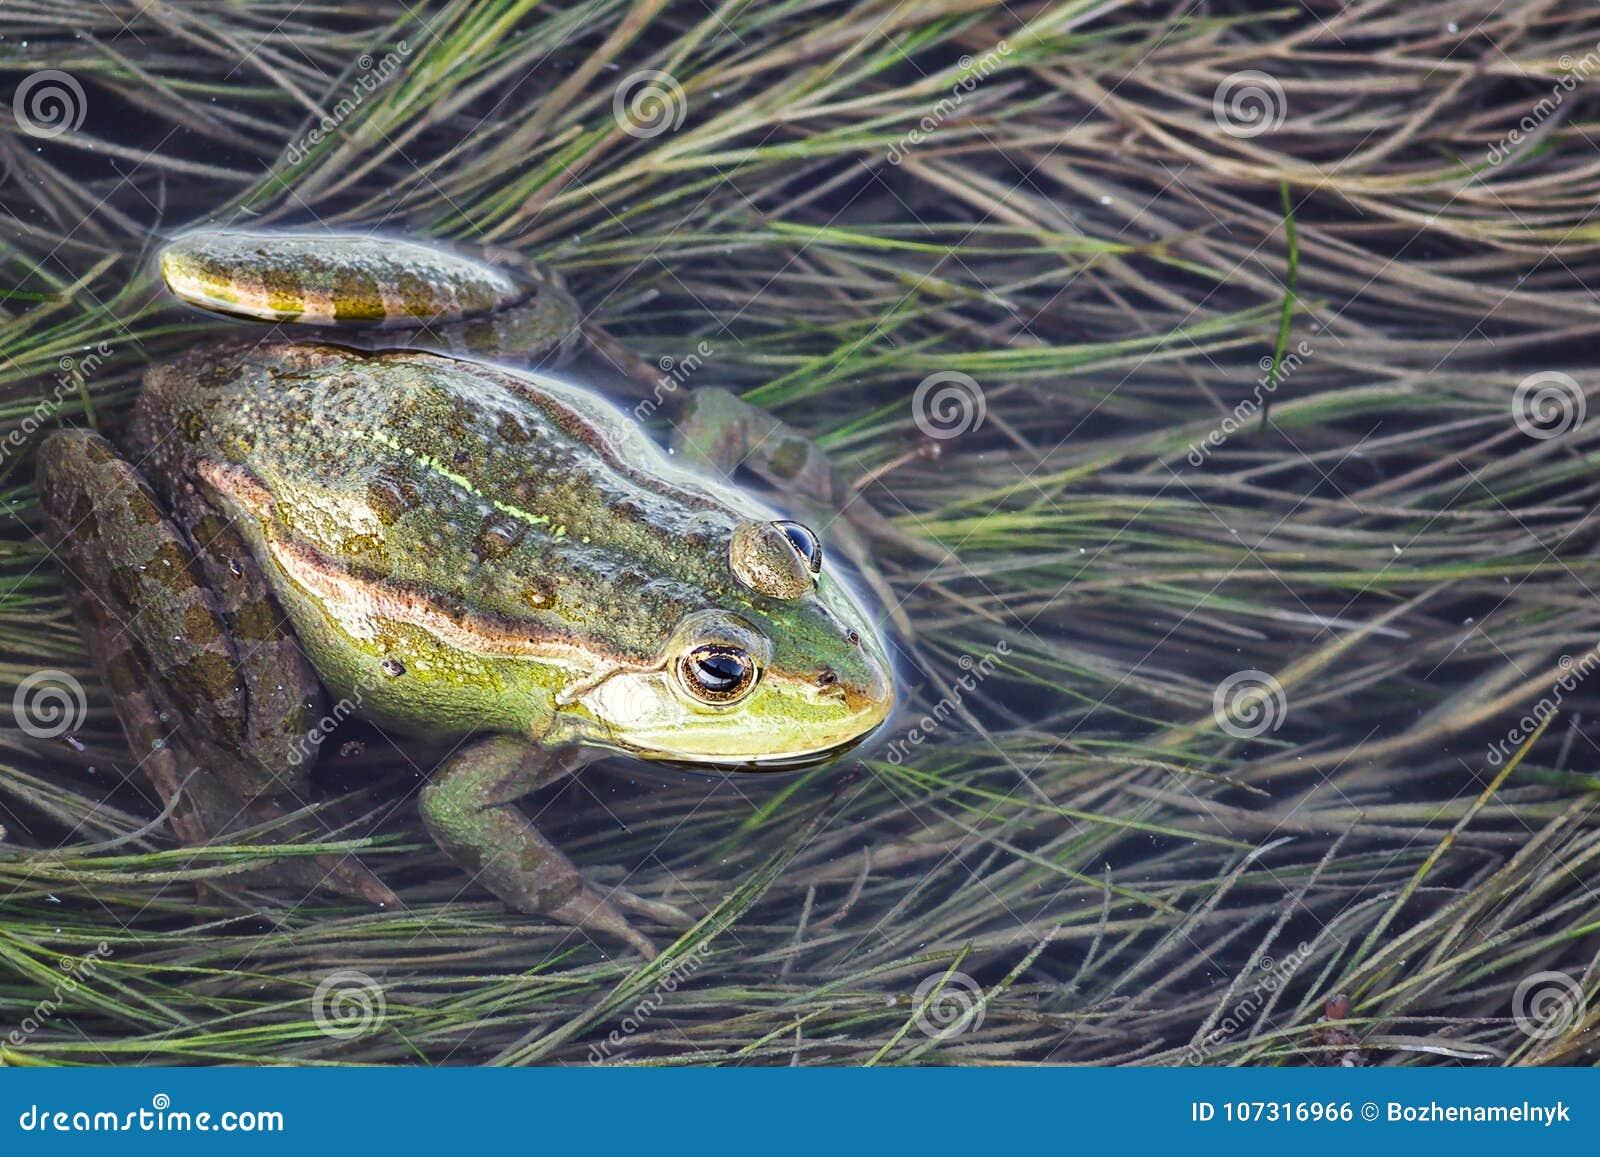 Marsh frog in pond full of weeds. Green frog Pelophylax esculentus sitting in water